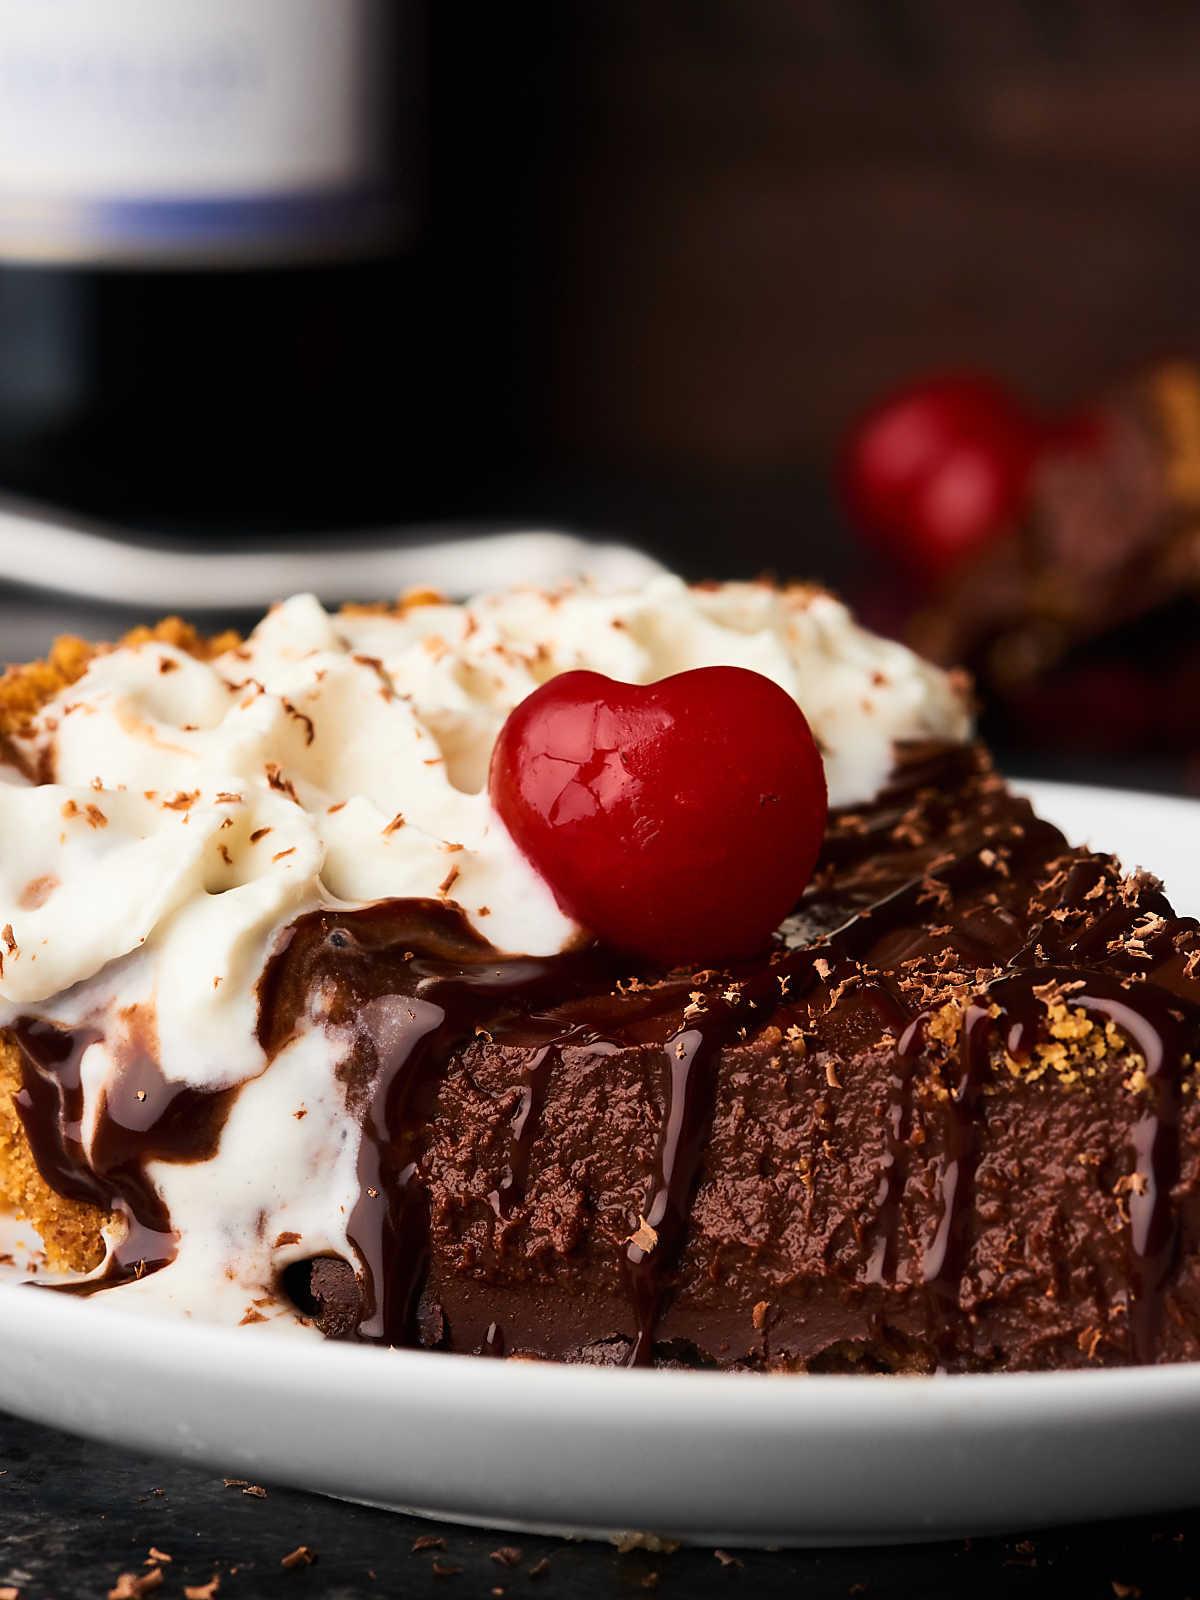 Chocolate Desserts Easy  Red Wine Chocolate Pudding Pie Recipe Easy Holiday Dessert